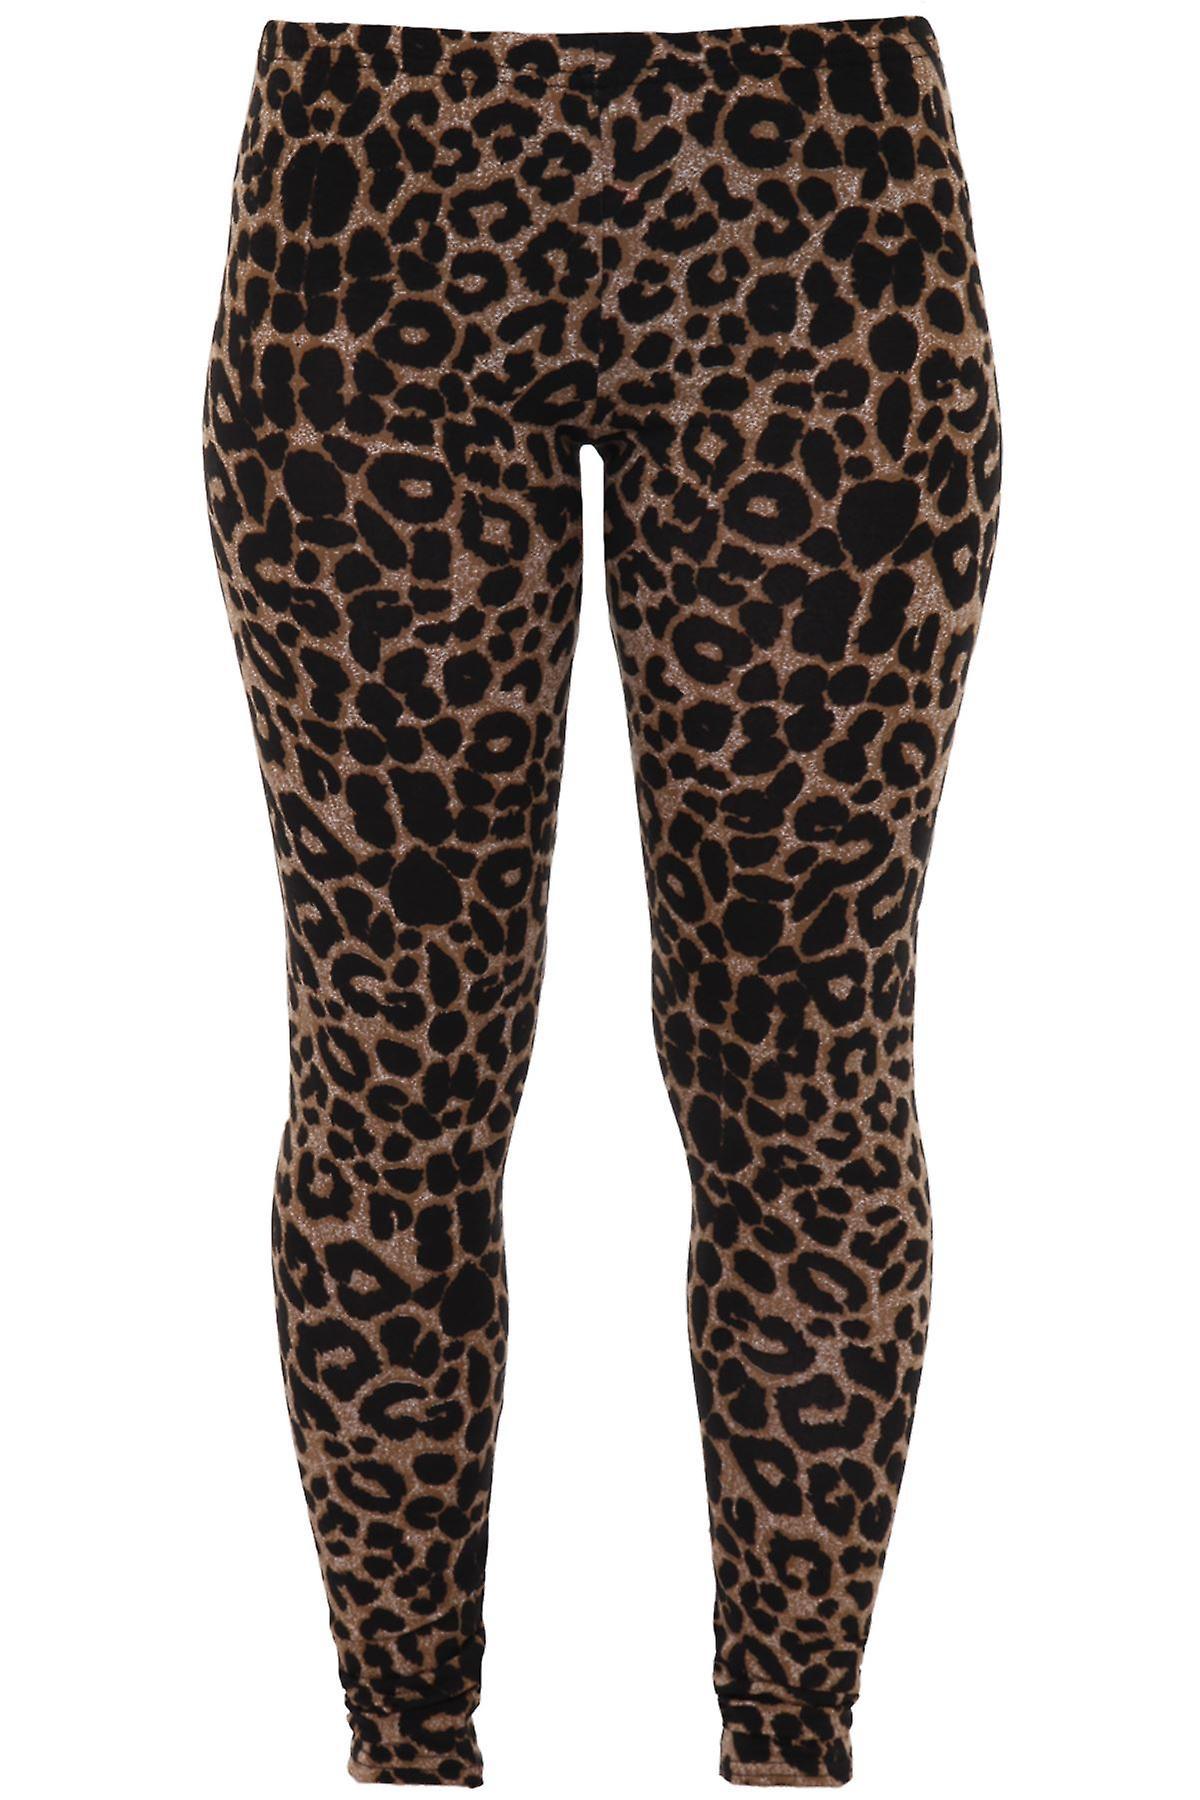 Childrens Animal Leopard Bright Neon Florescent Zebra Print Stretch Leggings